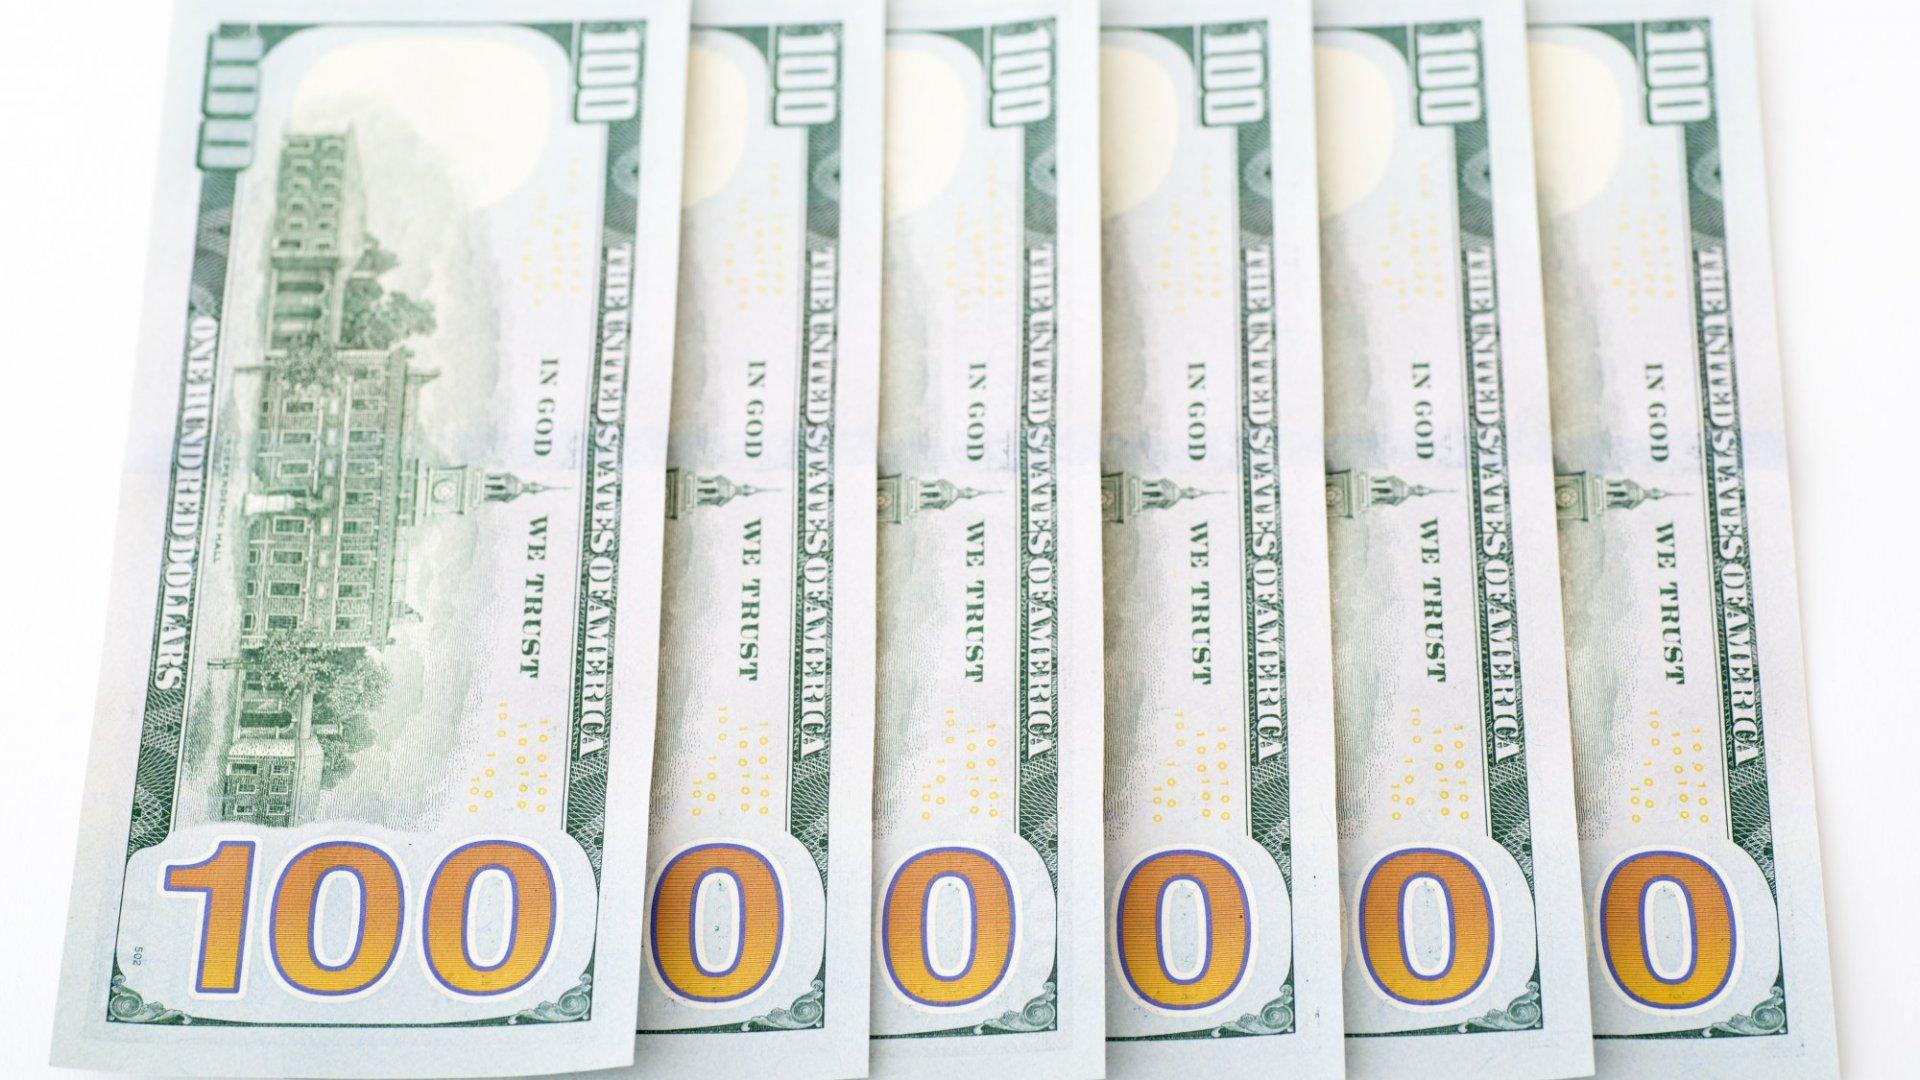 6 Secrets of This $100 Billion Venture Capitalist's Success